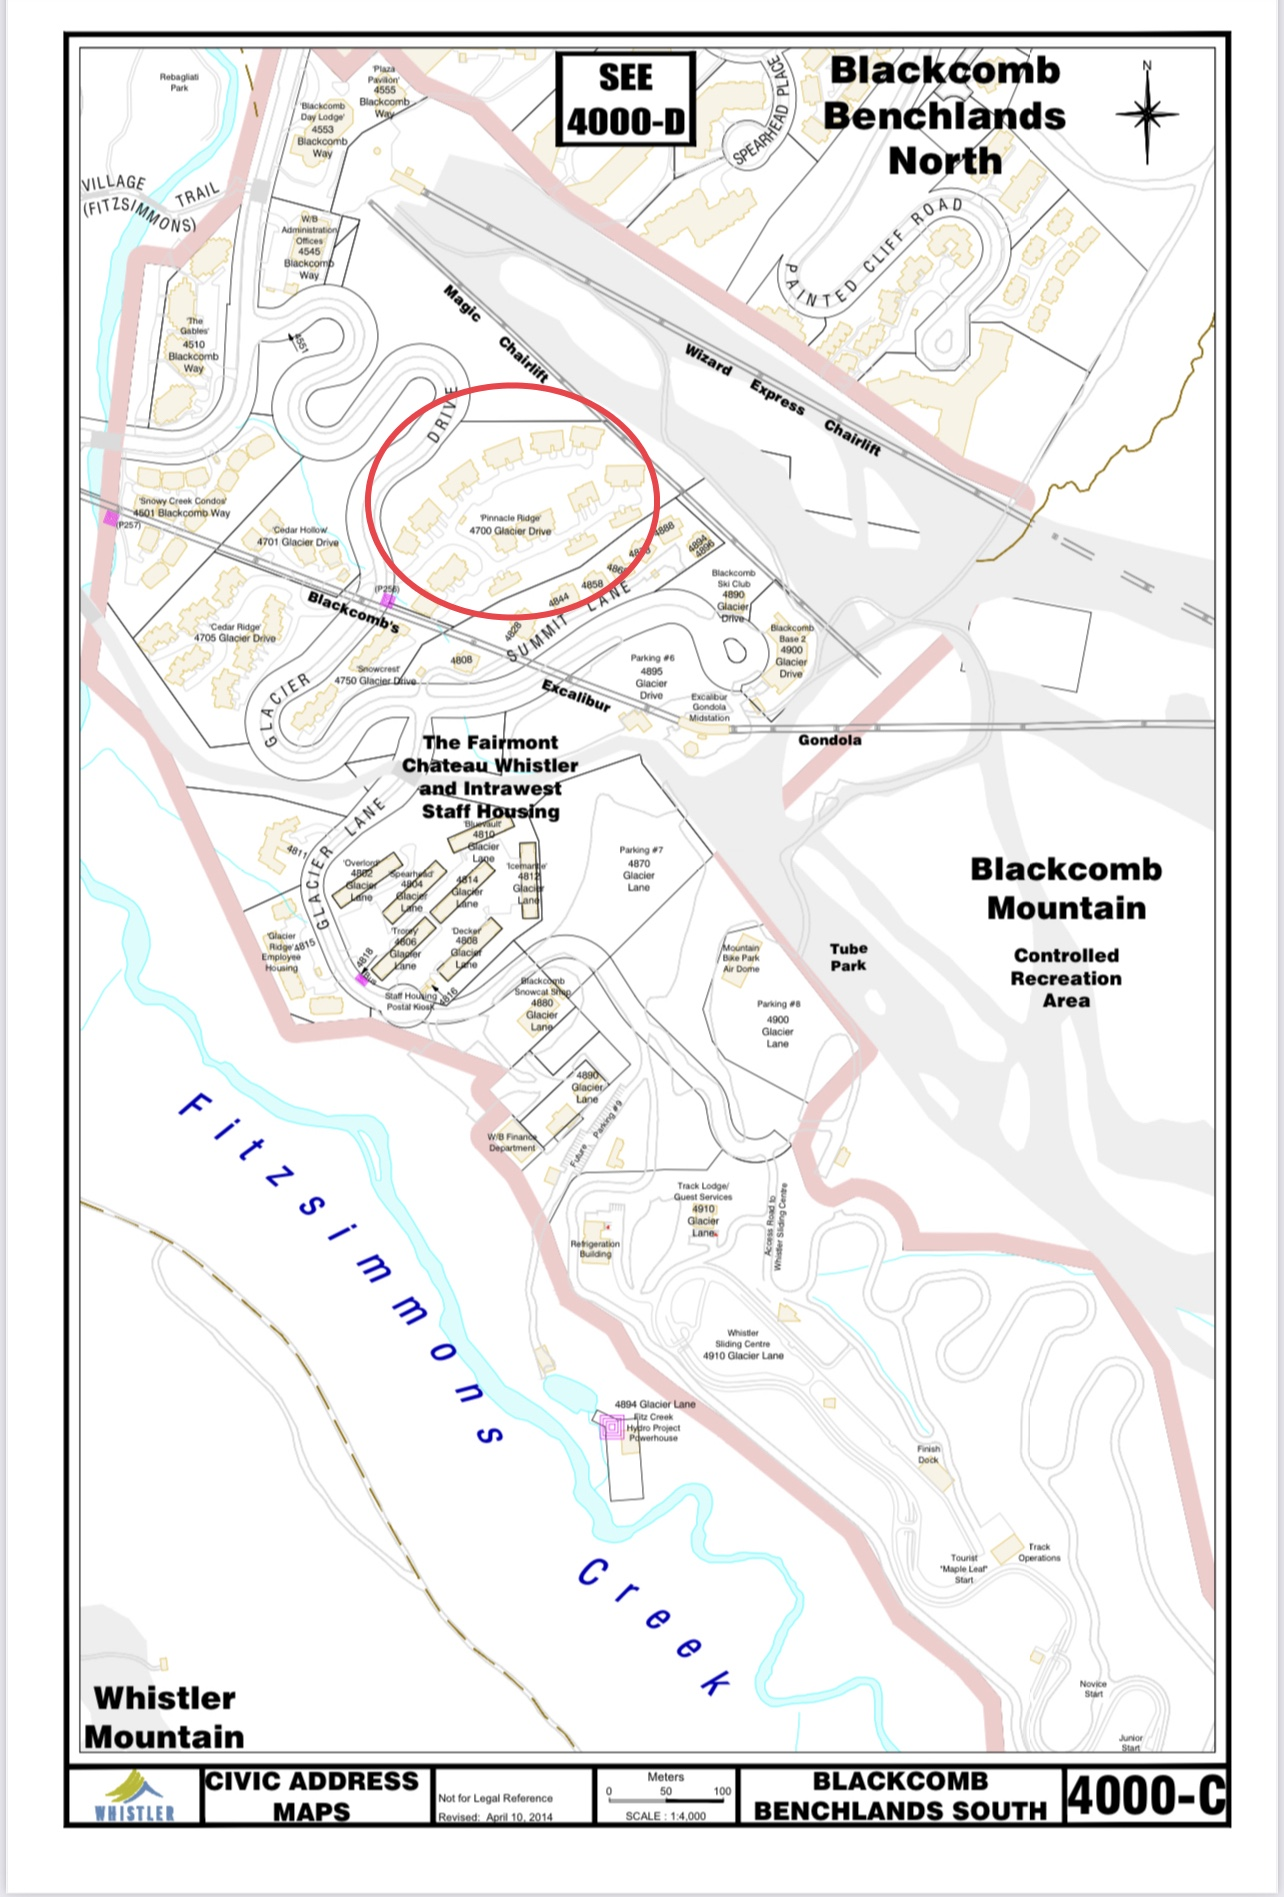 image Pinnacle Ridge Civic address map showing location on blackcomb mountain